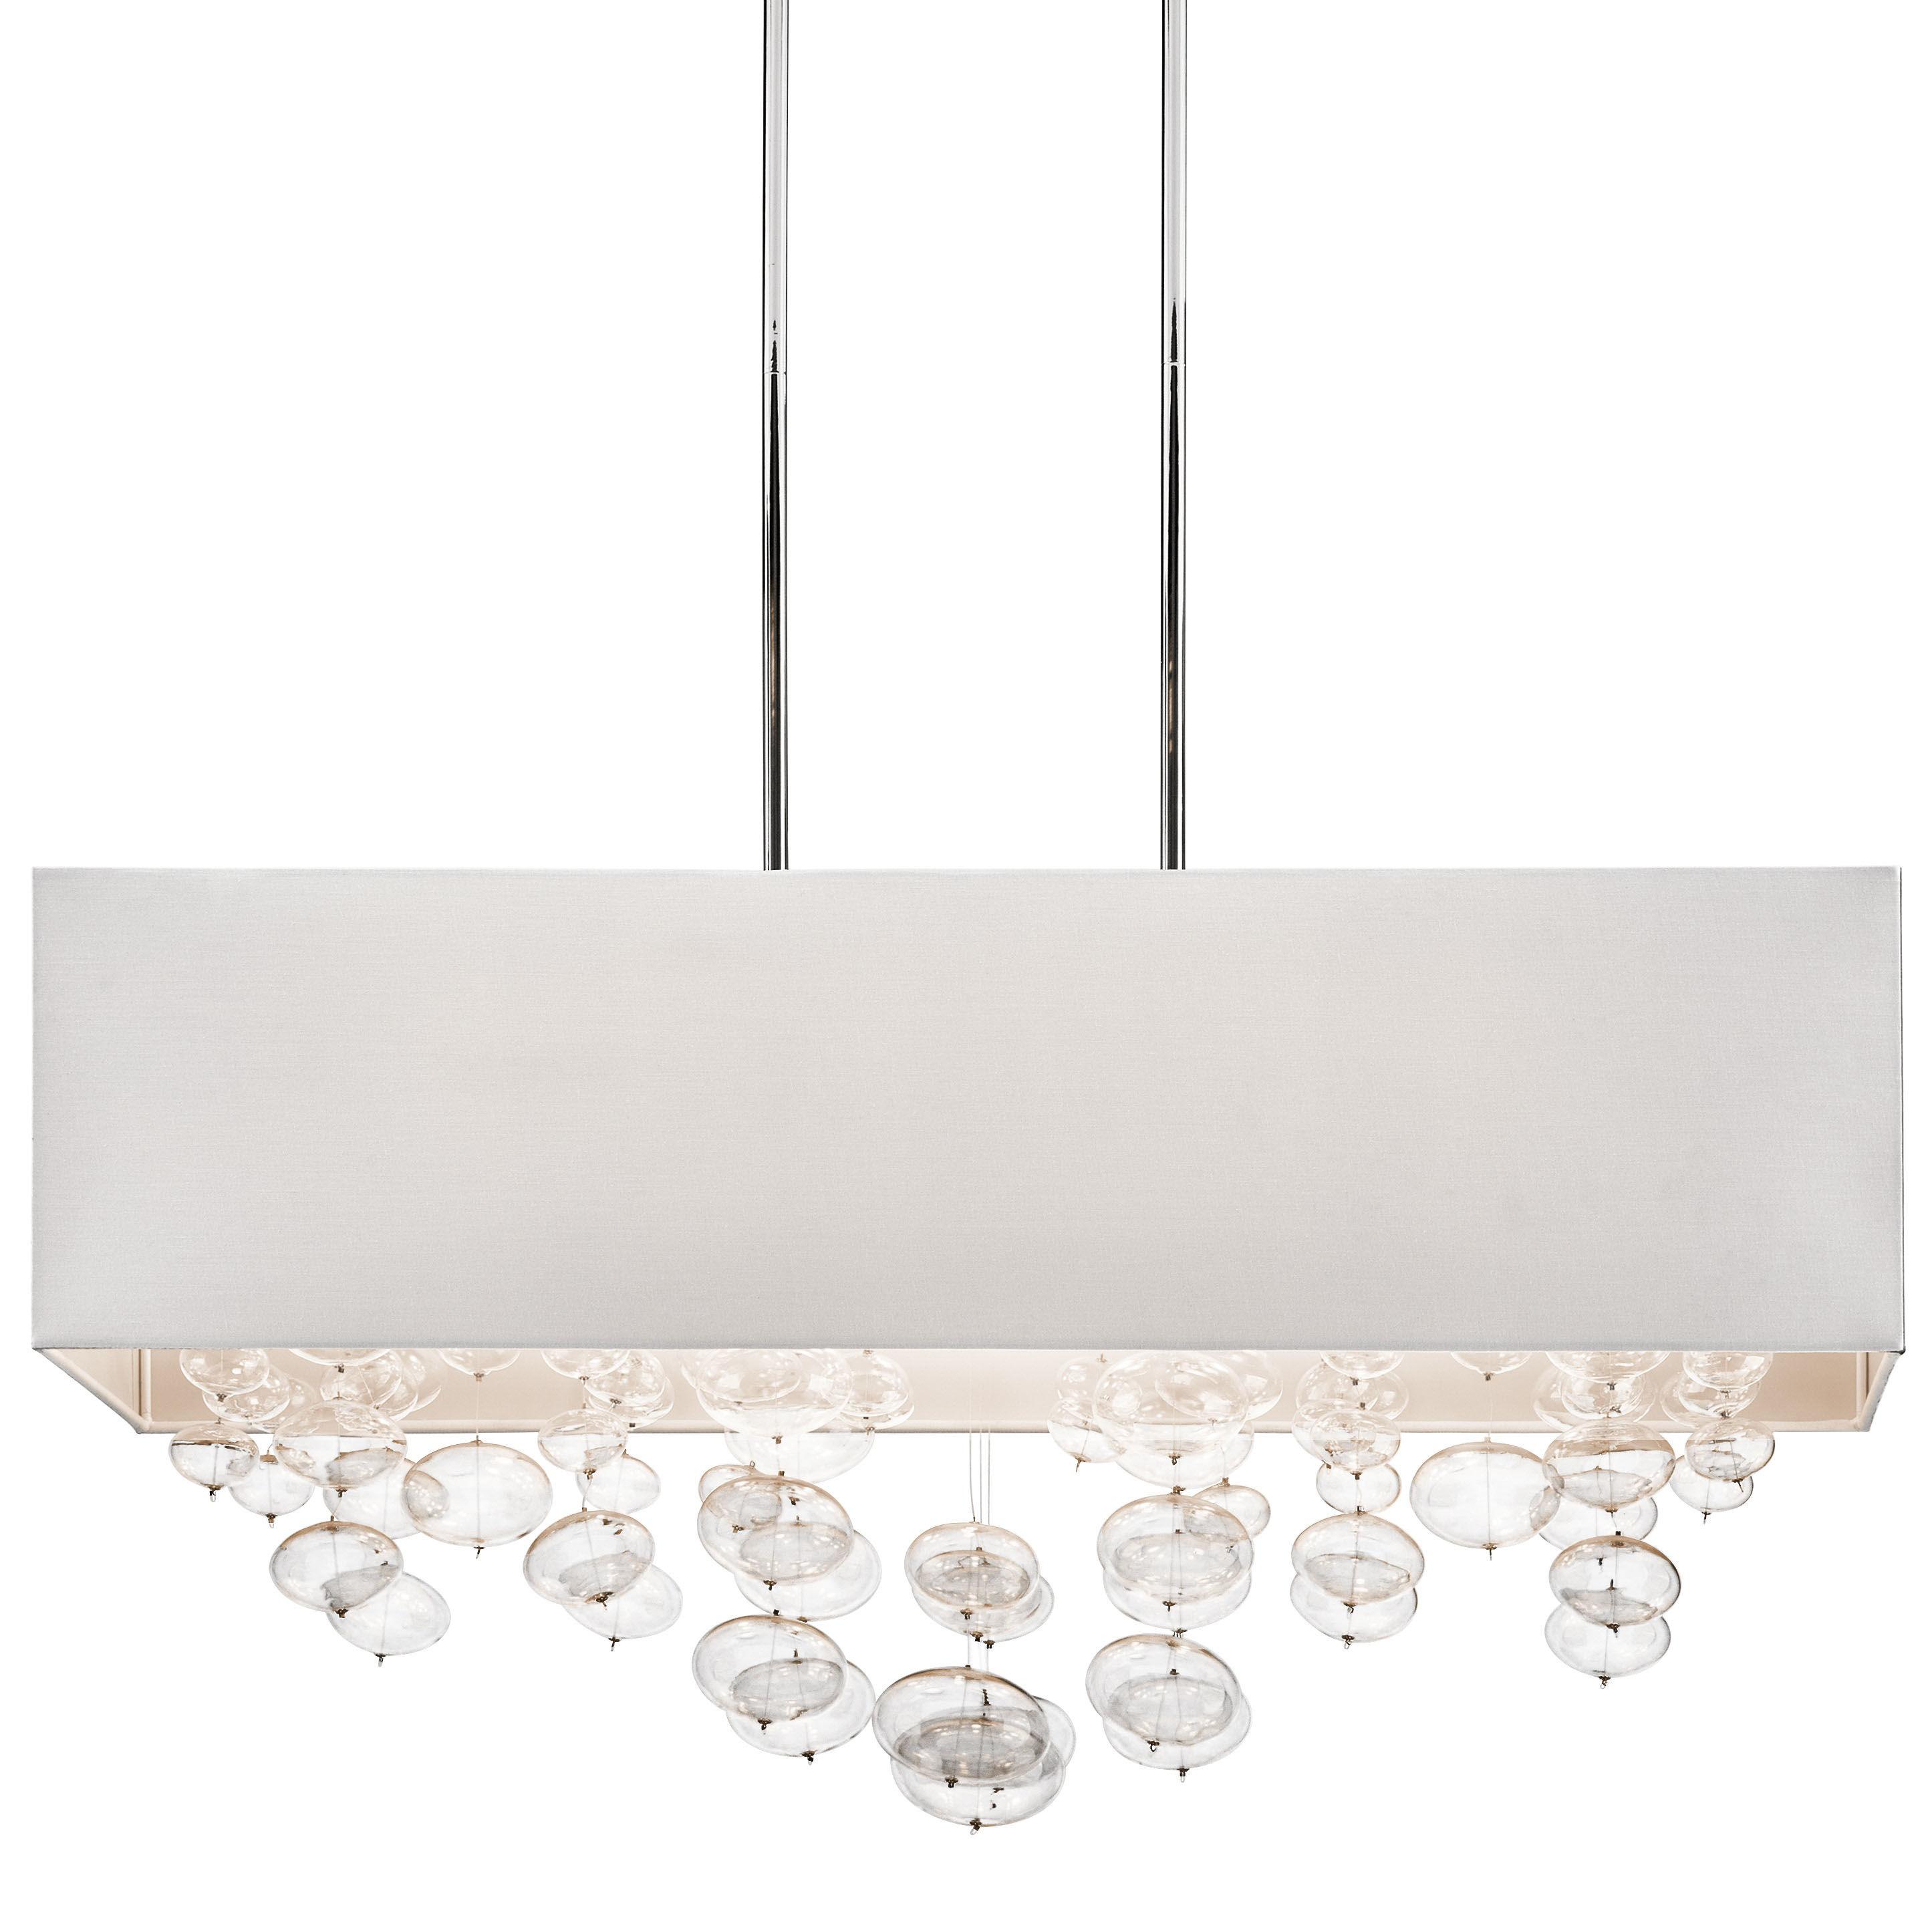 chandelier chandeliers images available killian allisonreidash now food linear lantern cooking light best pinterest on